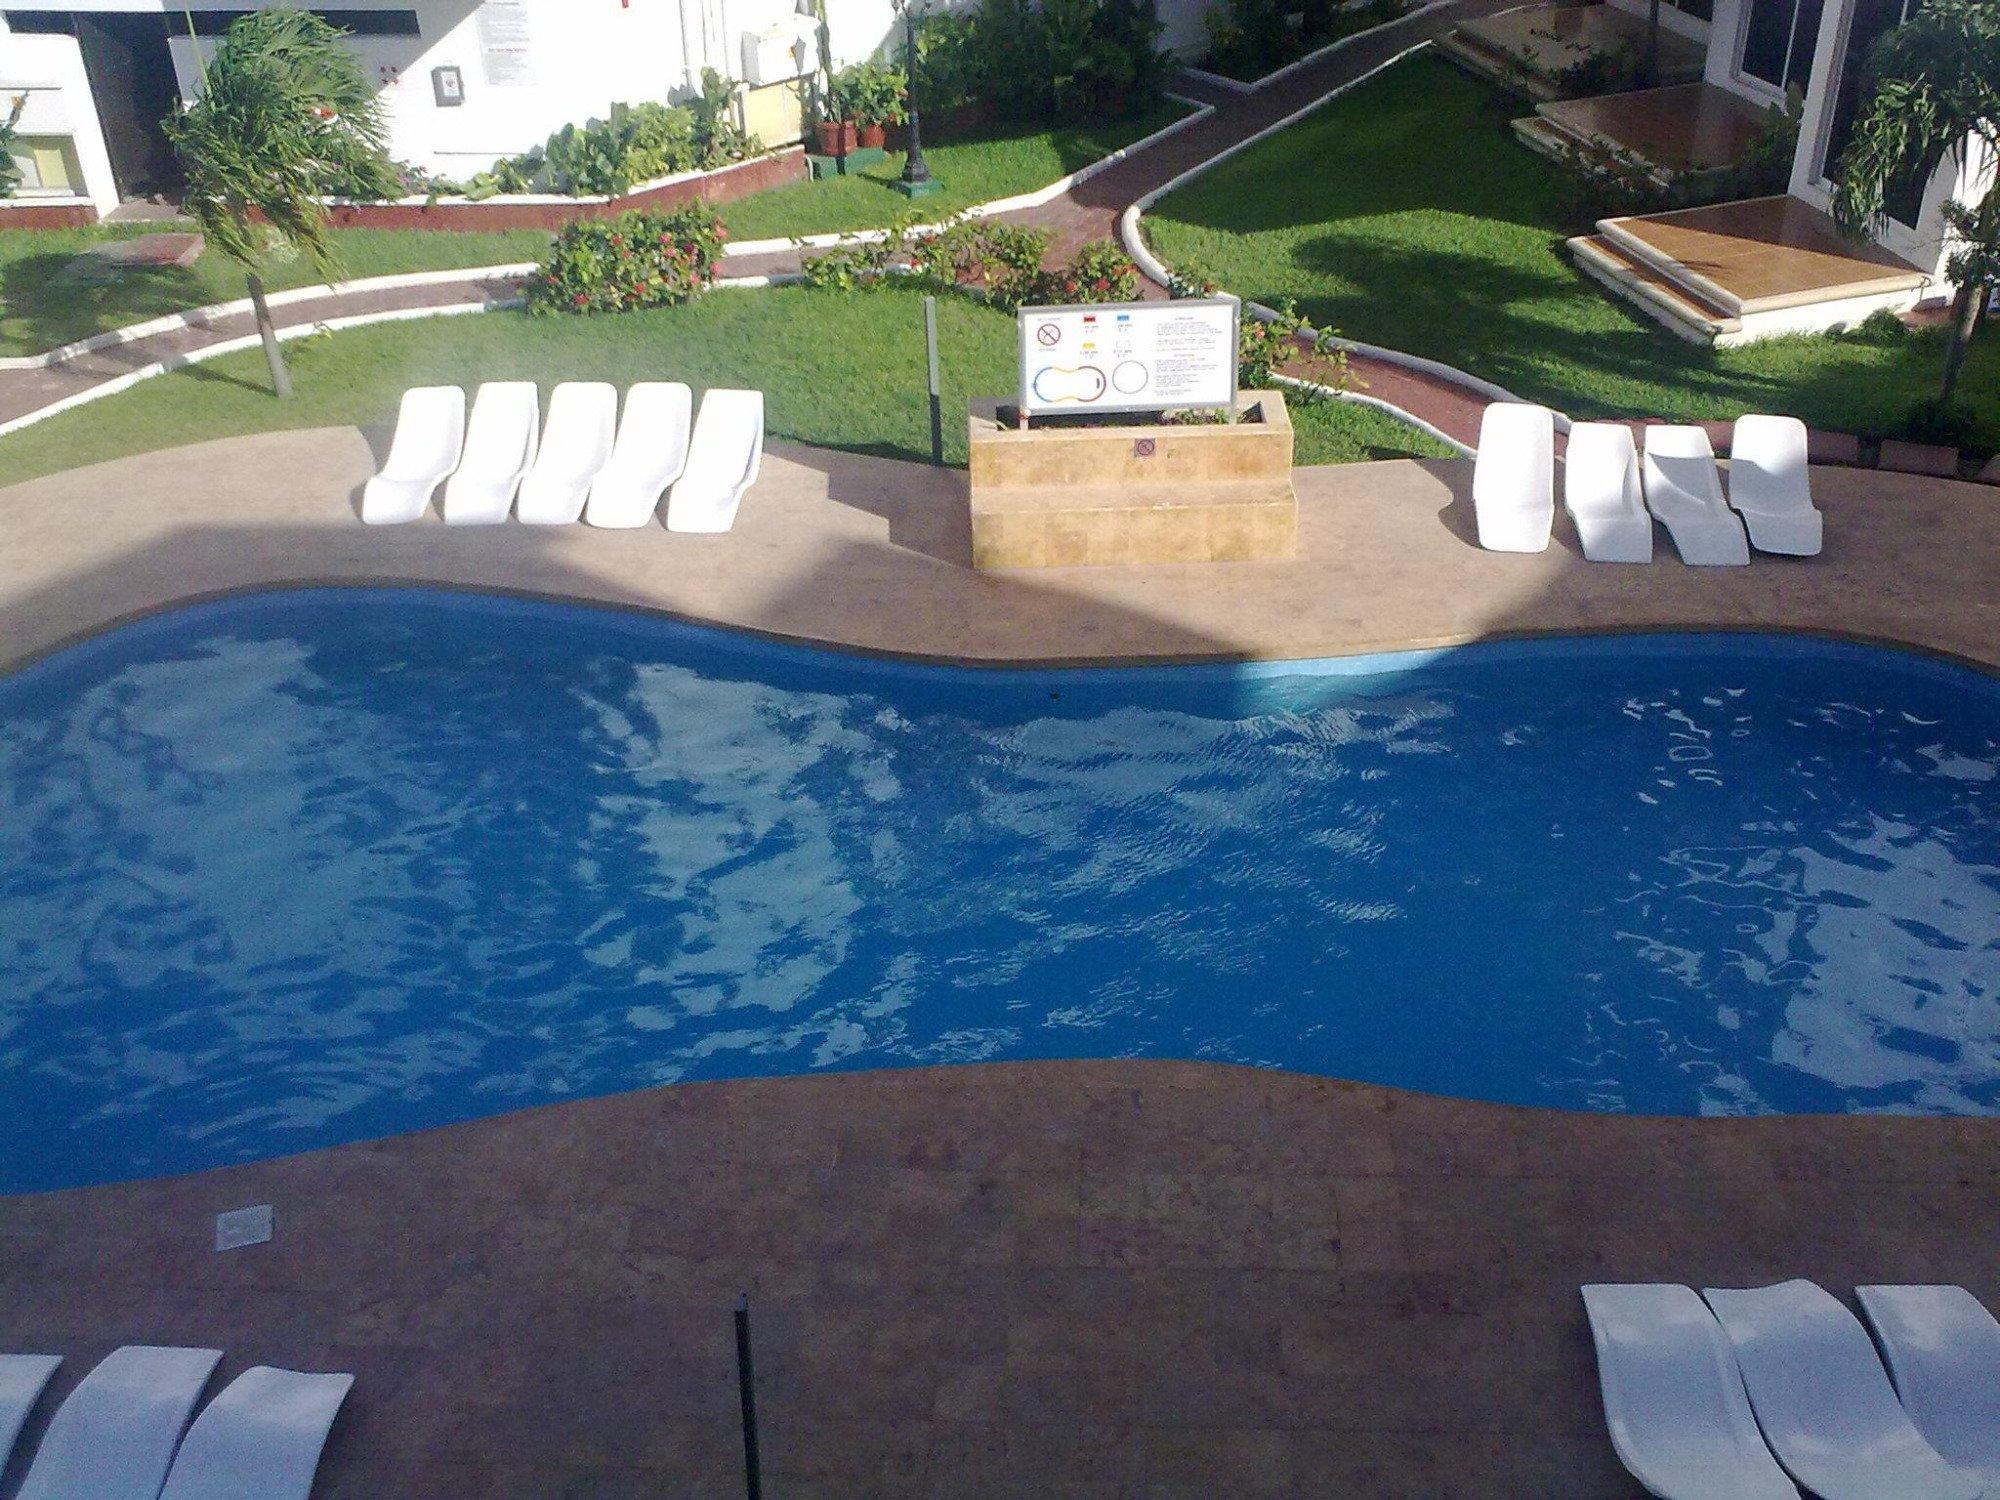 Enbarcadero picture of aquamarina beach hotel cancun tripadvisor - Hotel Imperial Las Perlas Updated 2017 Prices Reviews Photos Cancun Mexico Tripadvisor